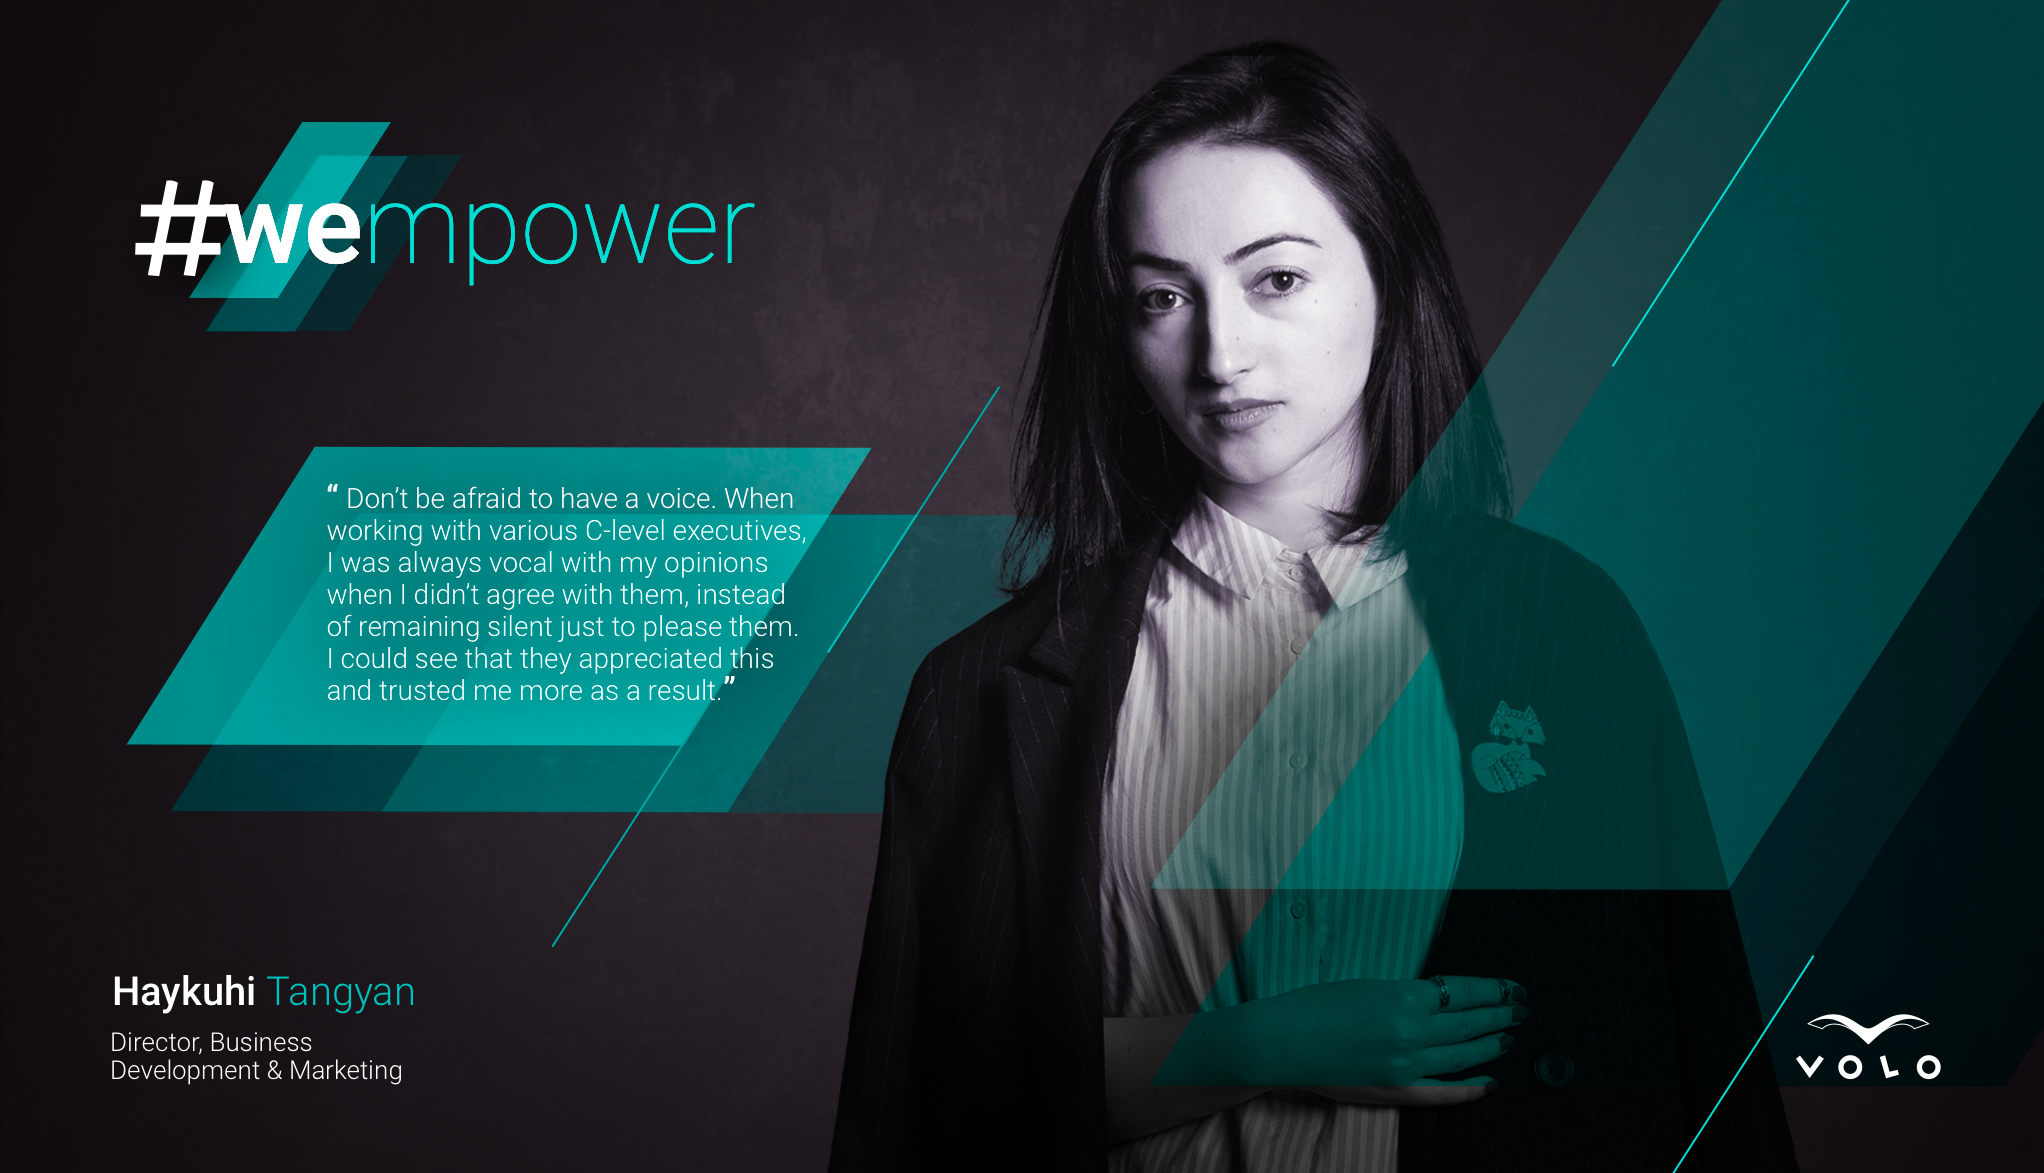 We Empower Women in Tech